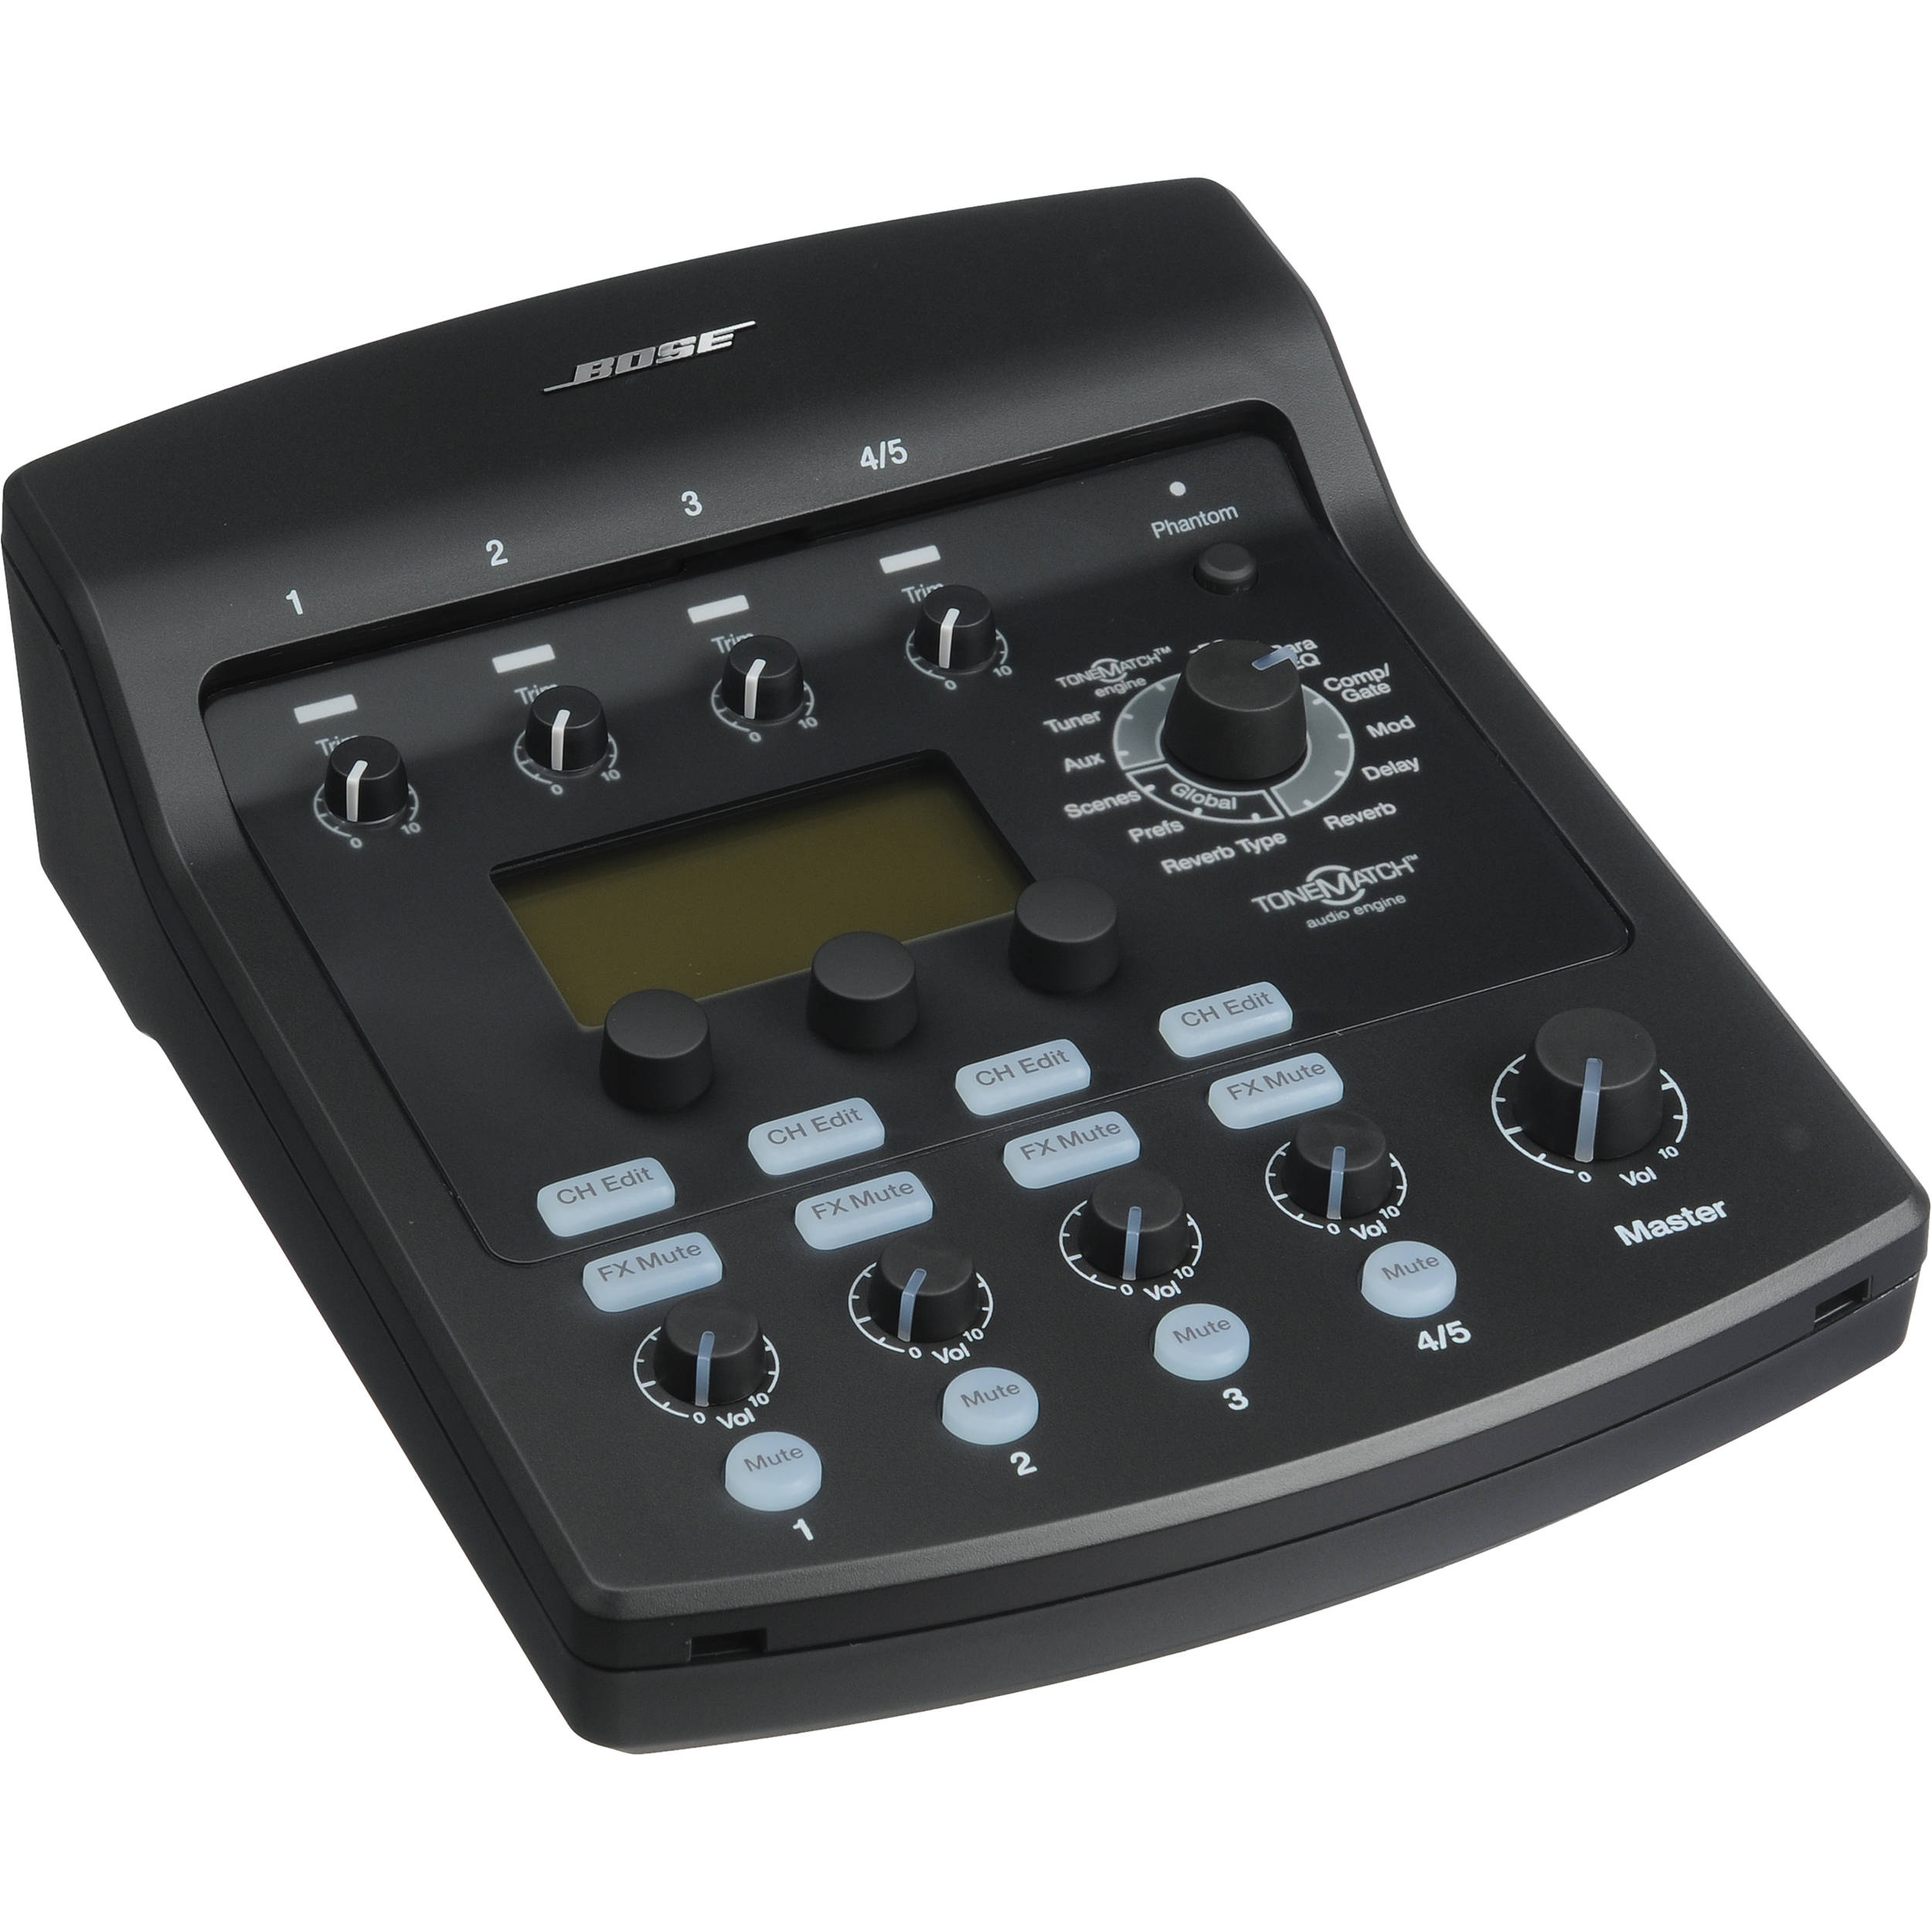 bose t1 tonematch audio engine and mixer 351968 0010 b h photo rh bhphotovideo com bose t1 tonematch manual svenska bose t1 tonematch manual svenska